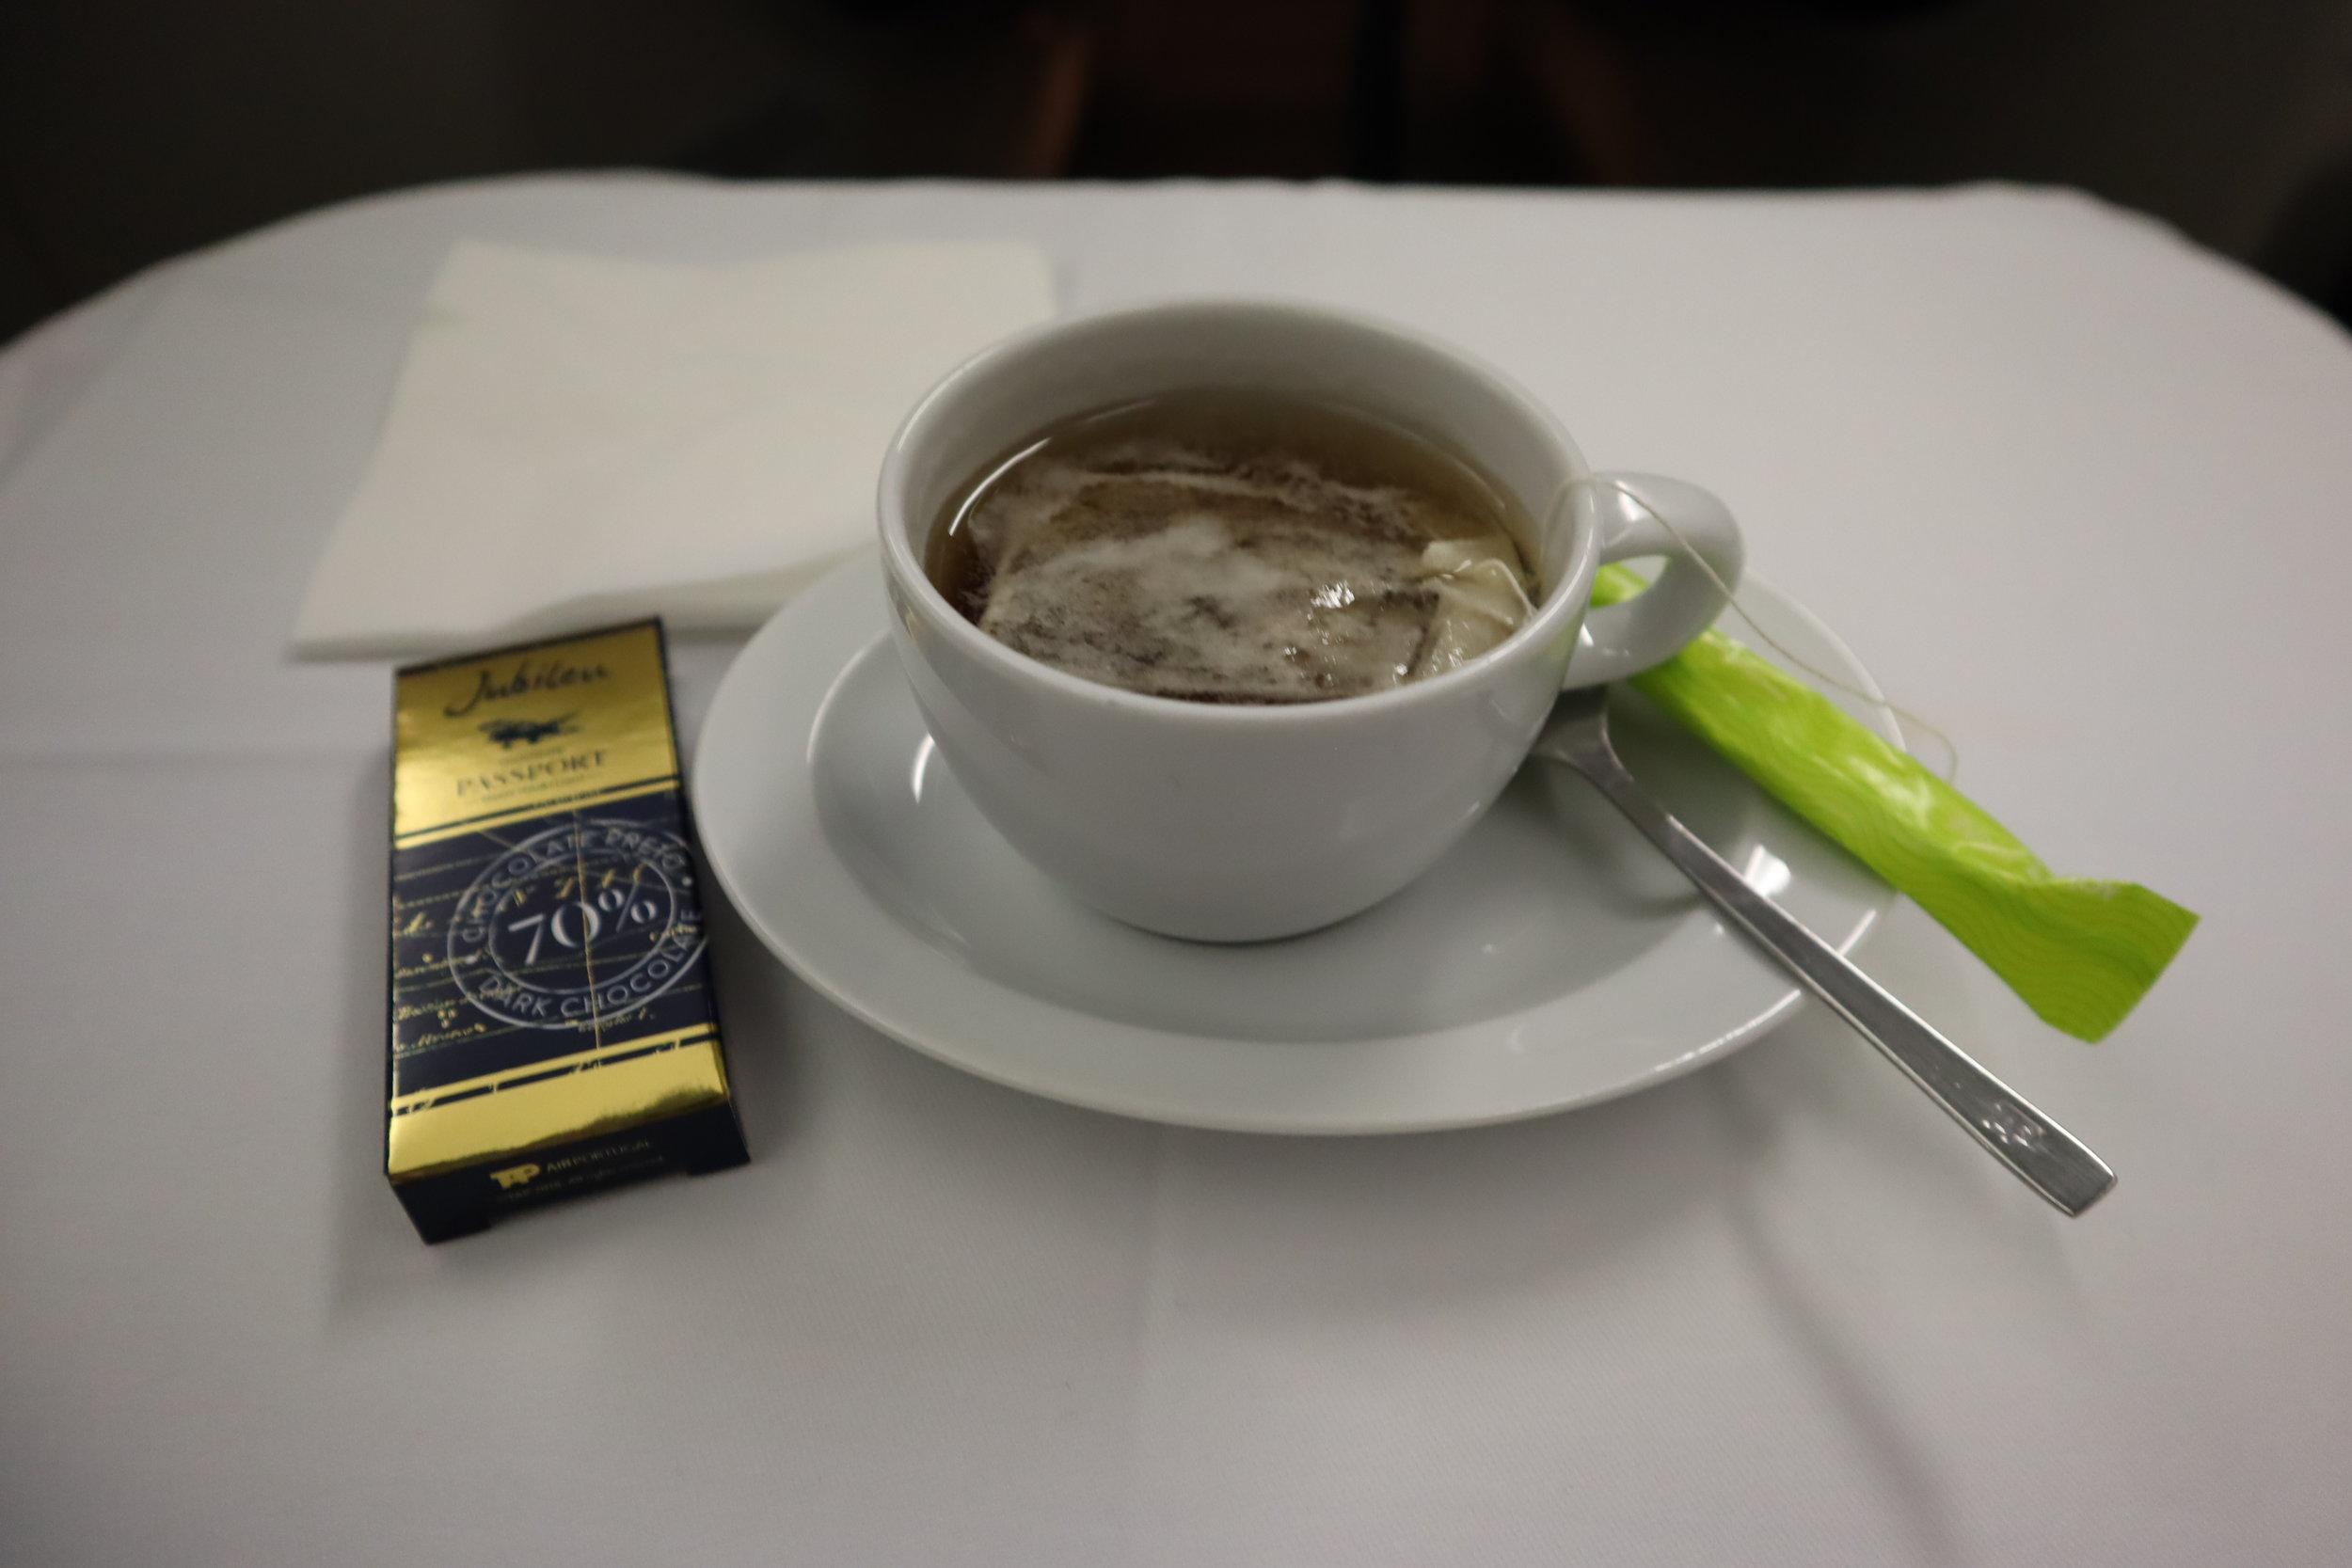 TAP Air Portugal business class – Green tea